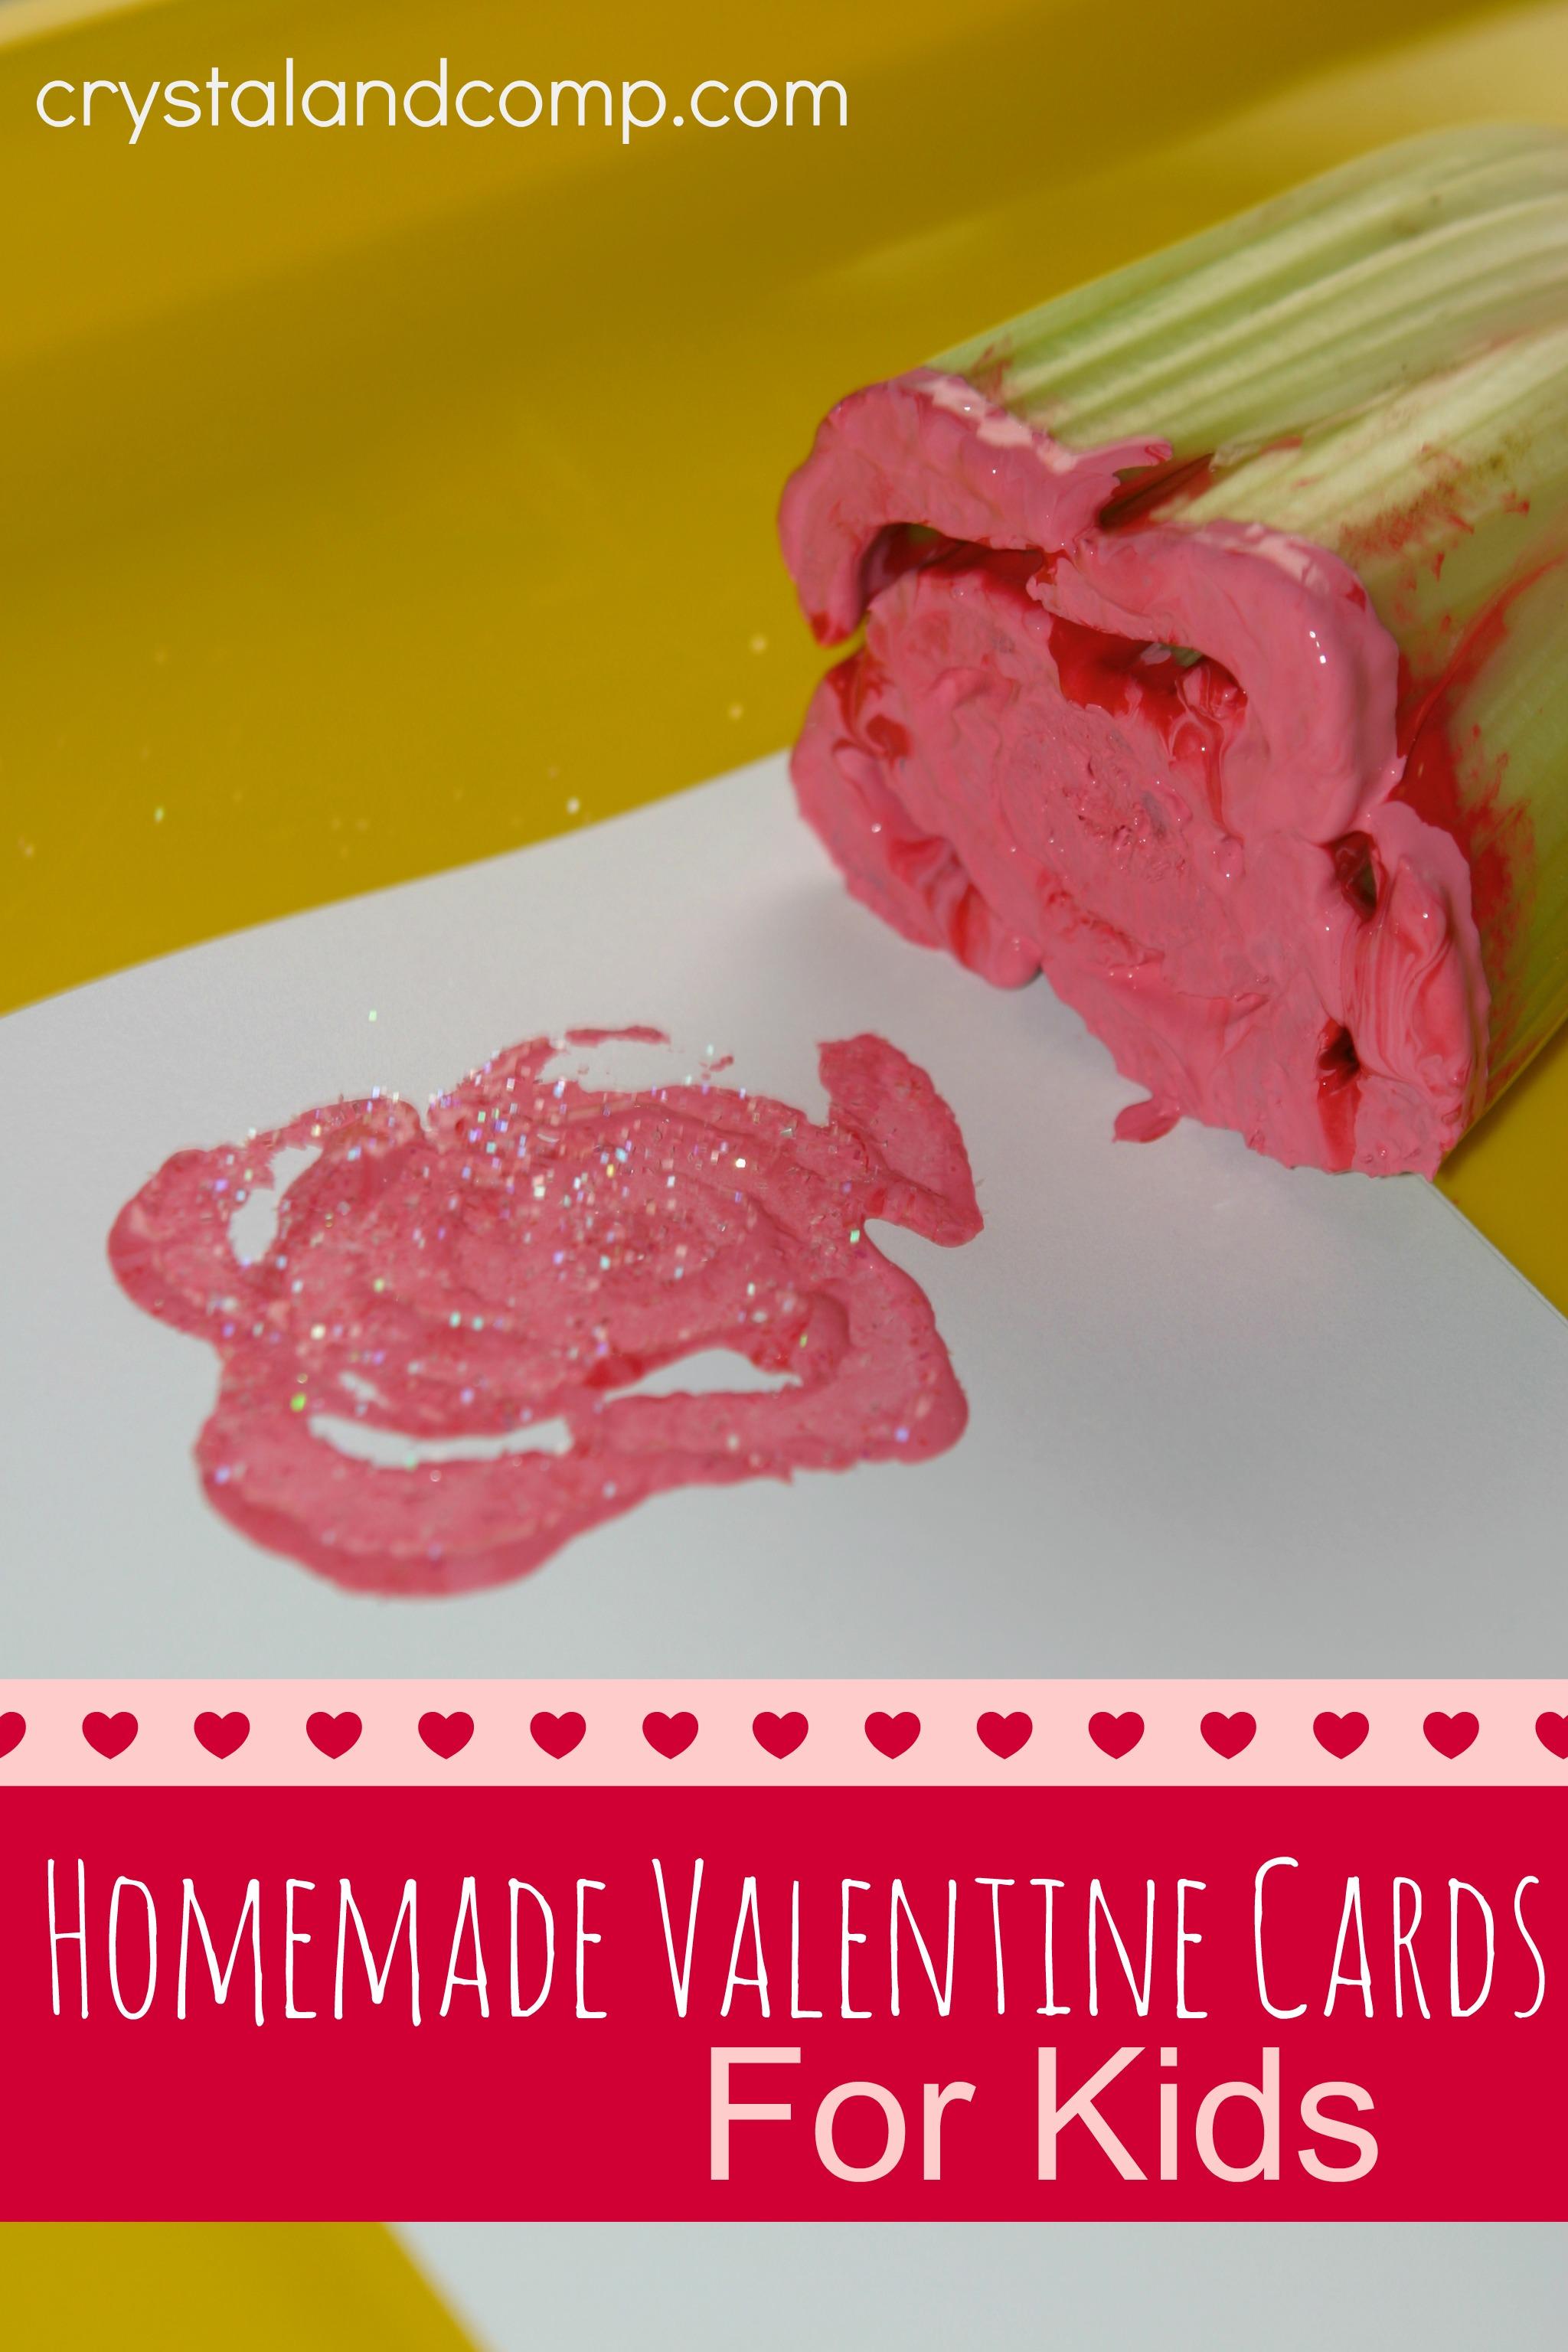 Homemade Valentine Cards For Kids